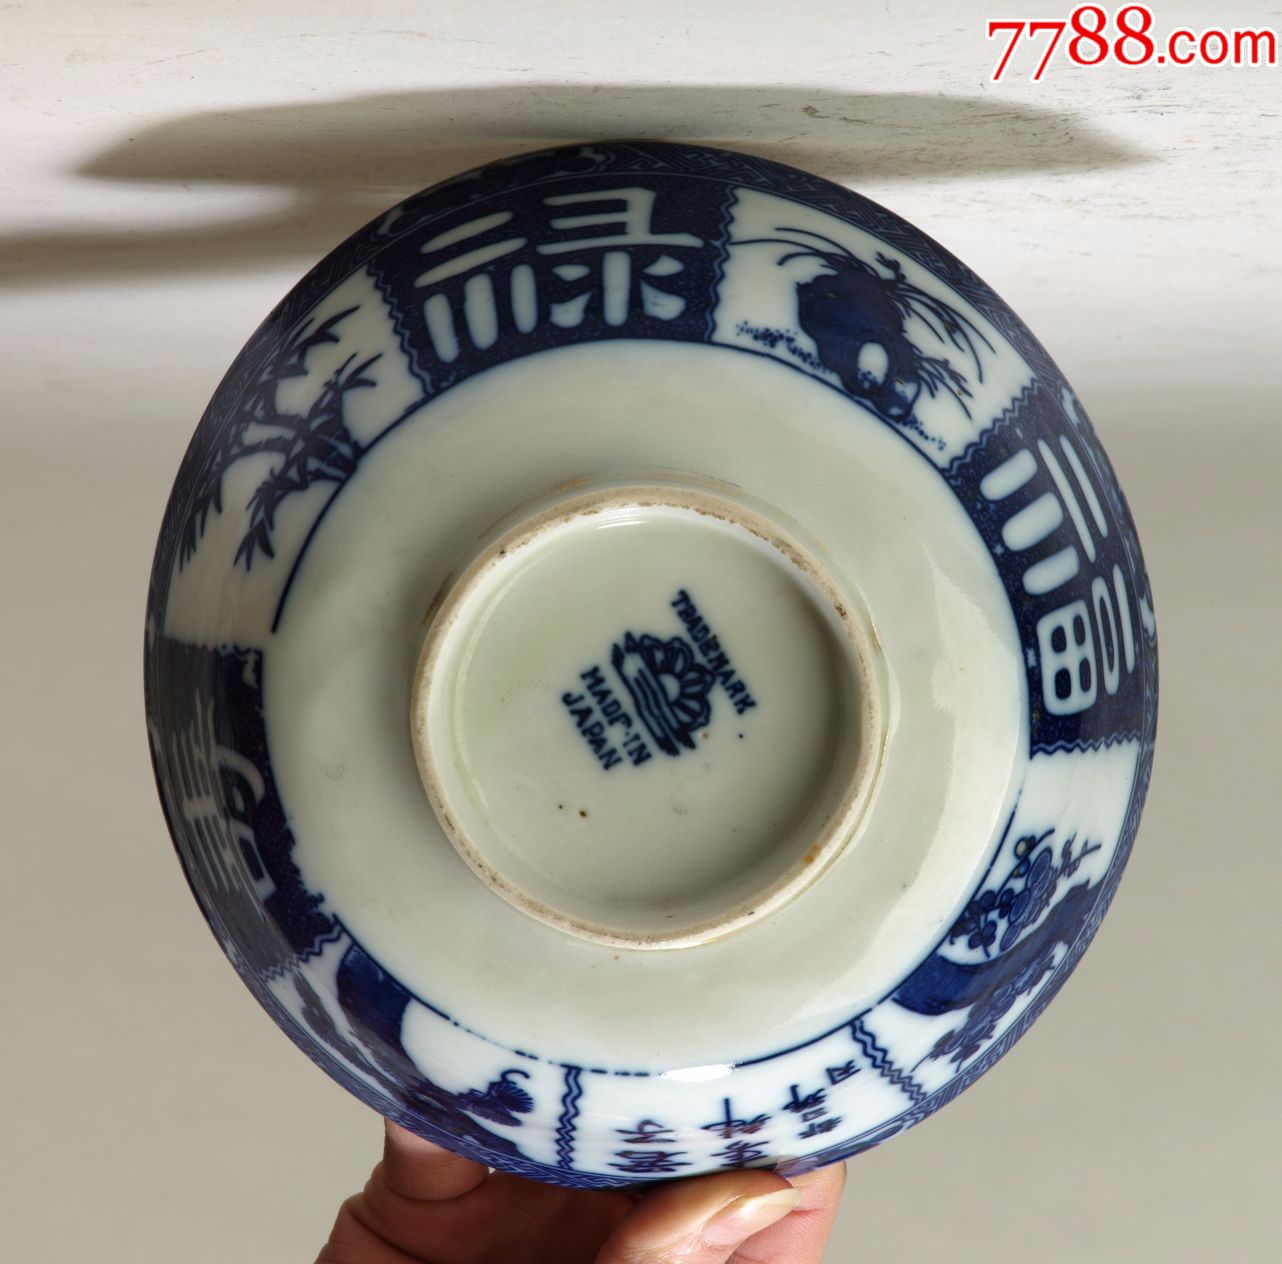 madeinjapan图片_青花碗,福禄寿,松竹梅兰,madeinjapan,1个